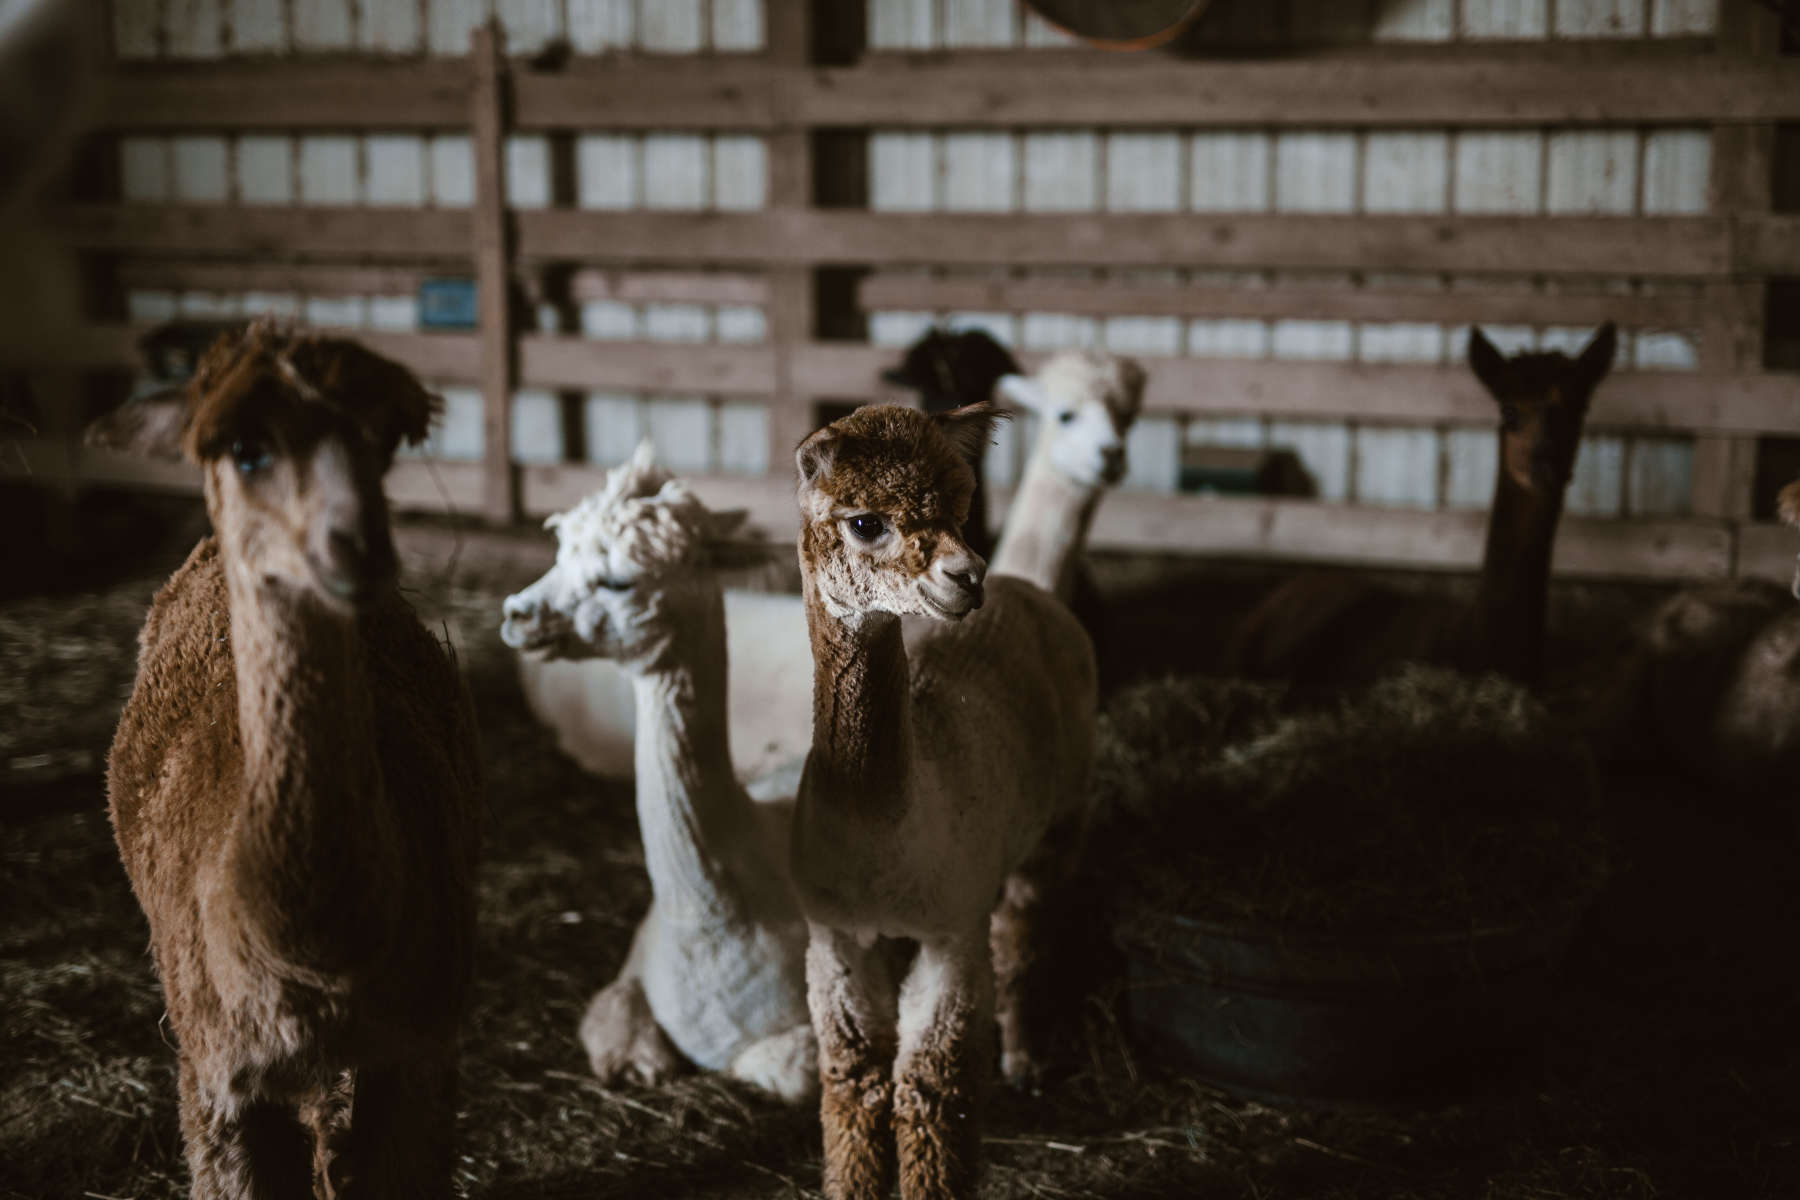 Alpaca dating sim vinny from jersey